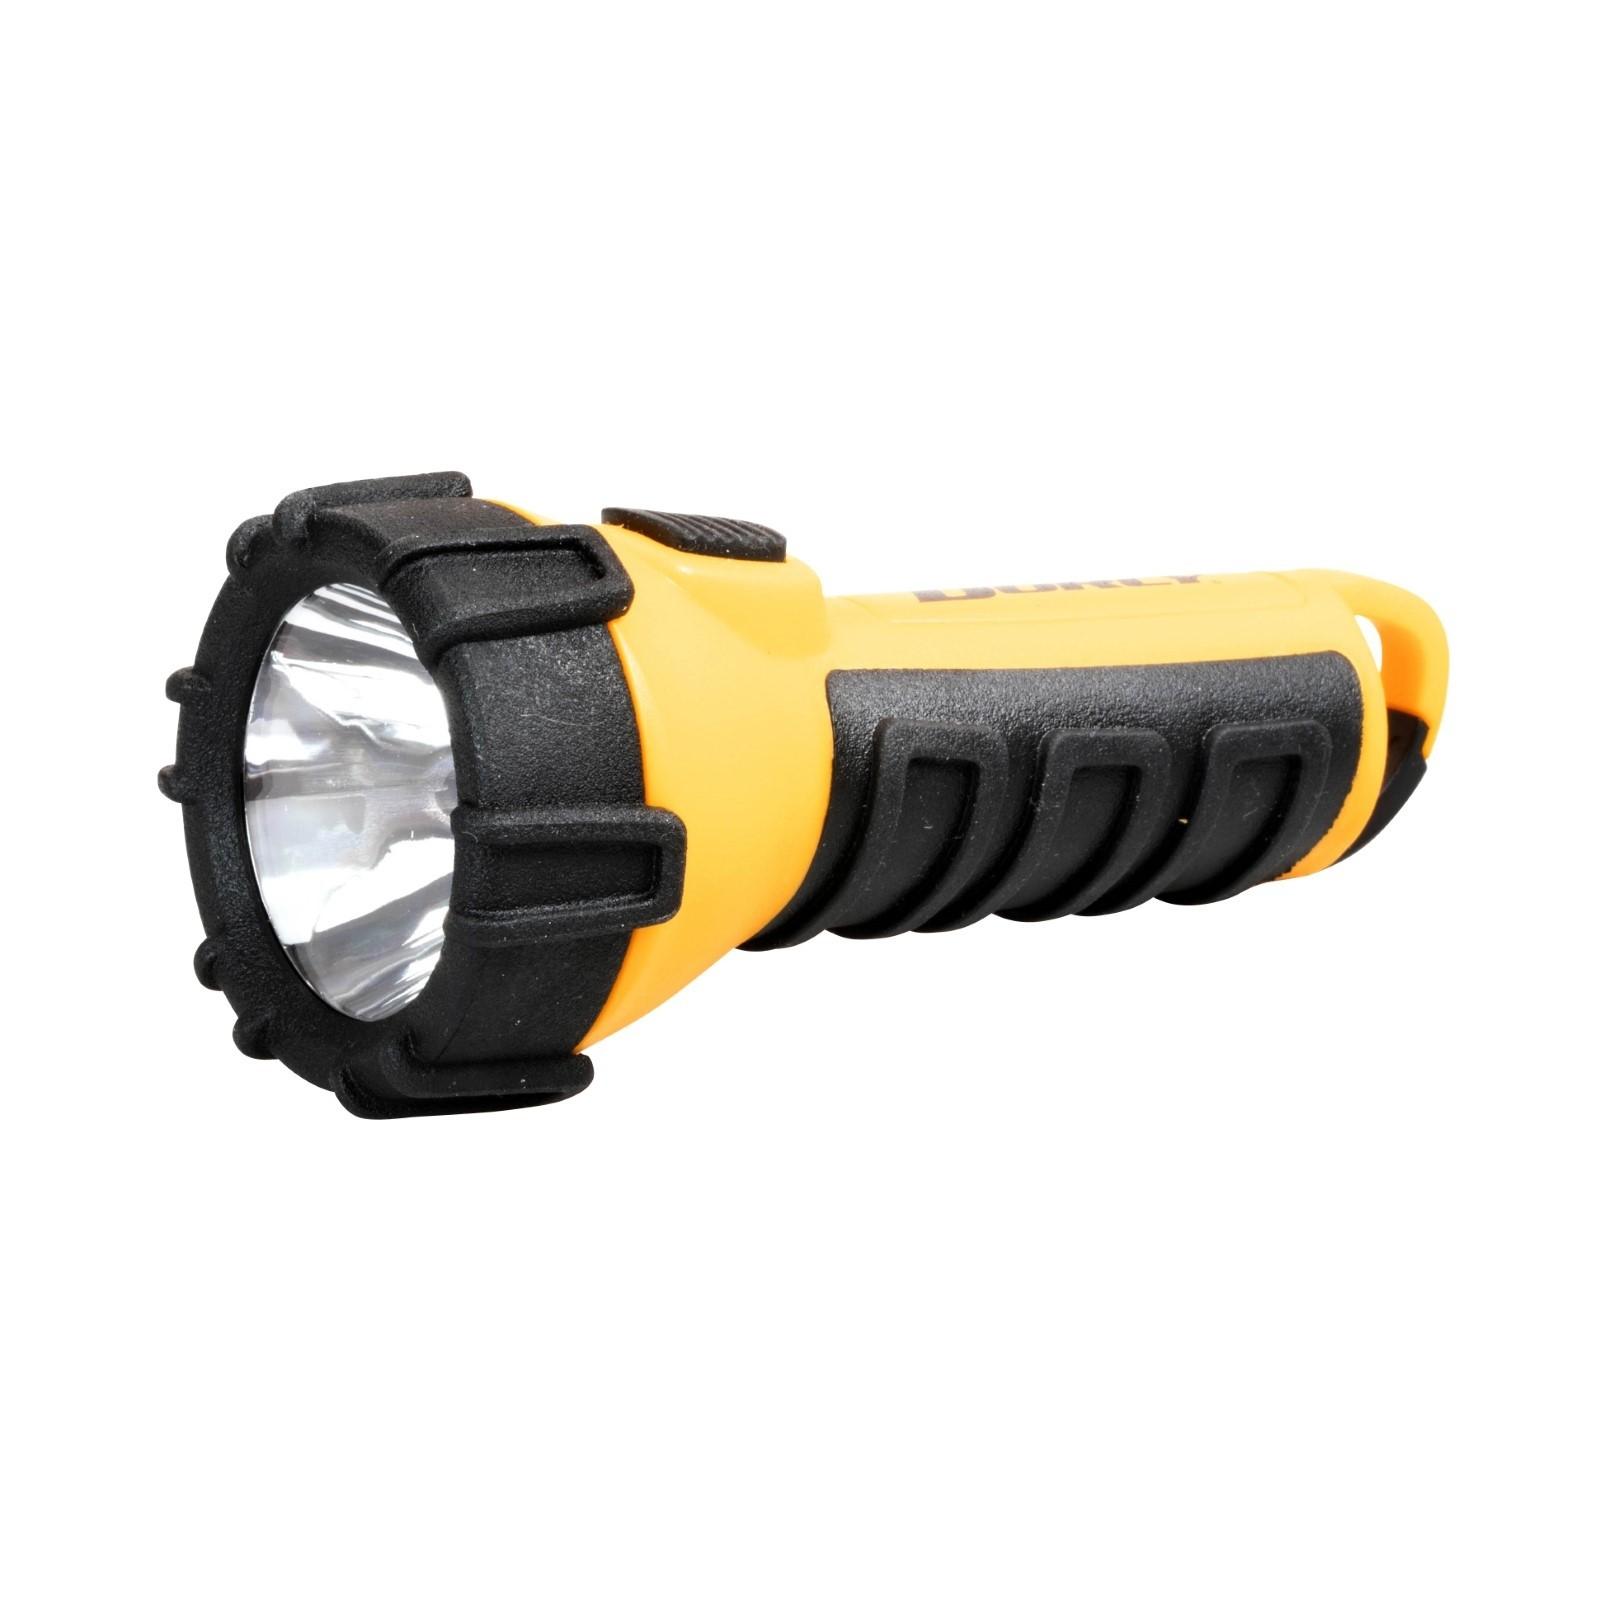 125 Lumen Compact Floating Flashlight